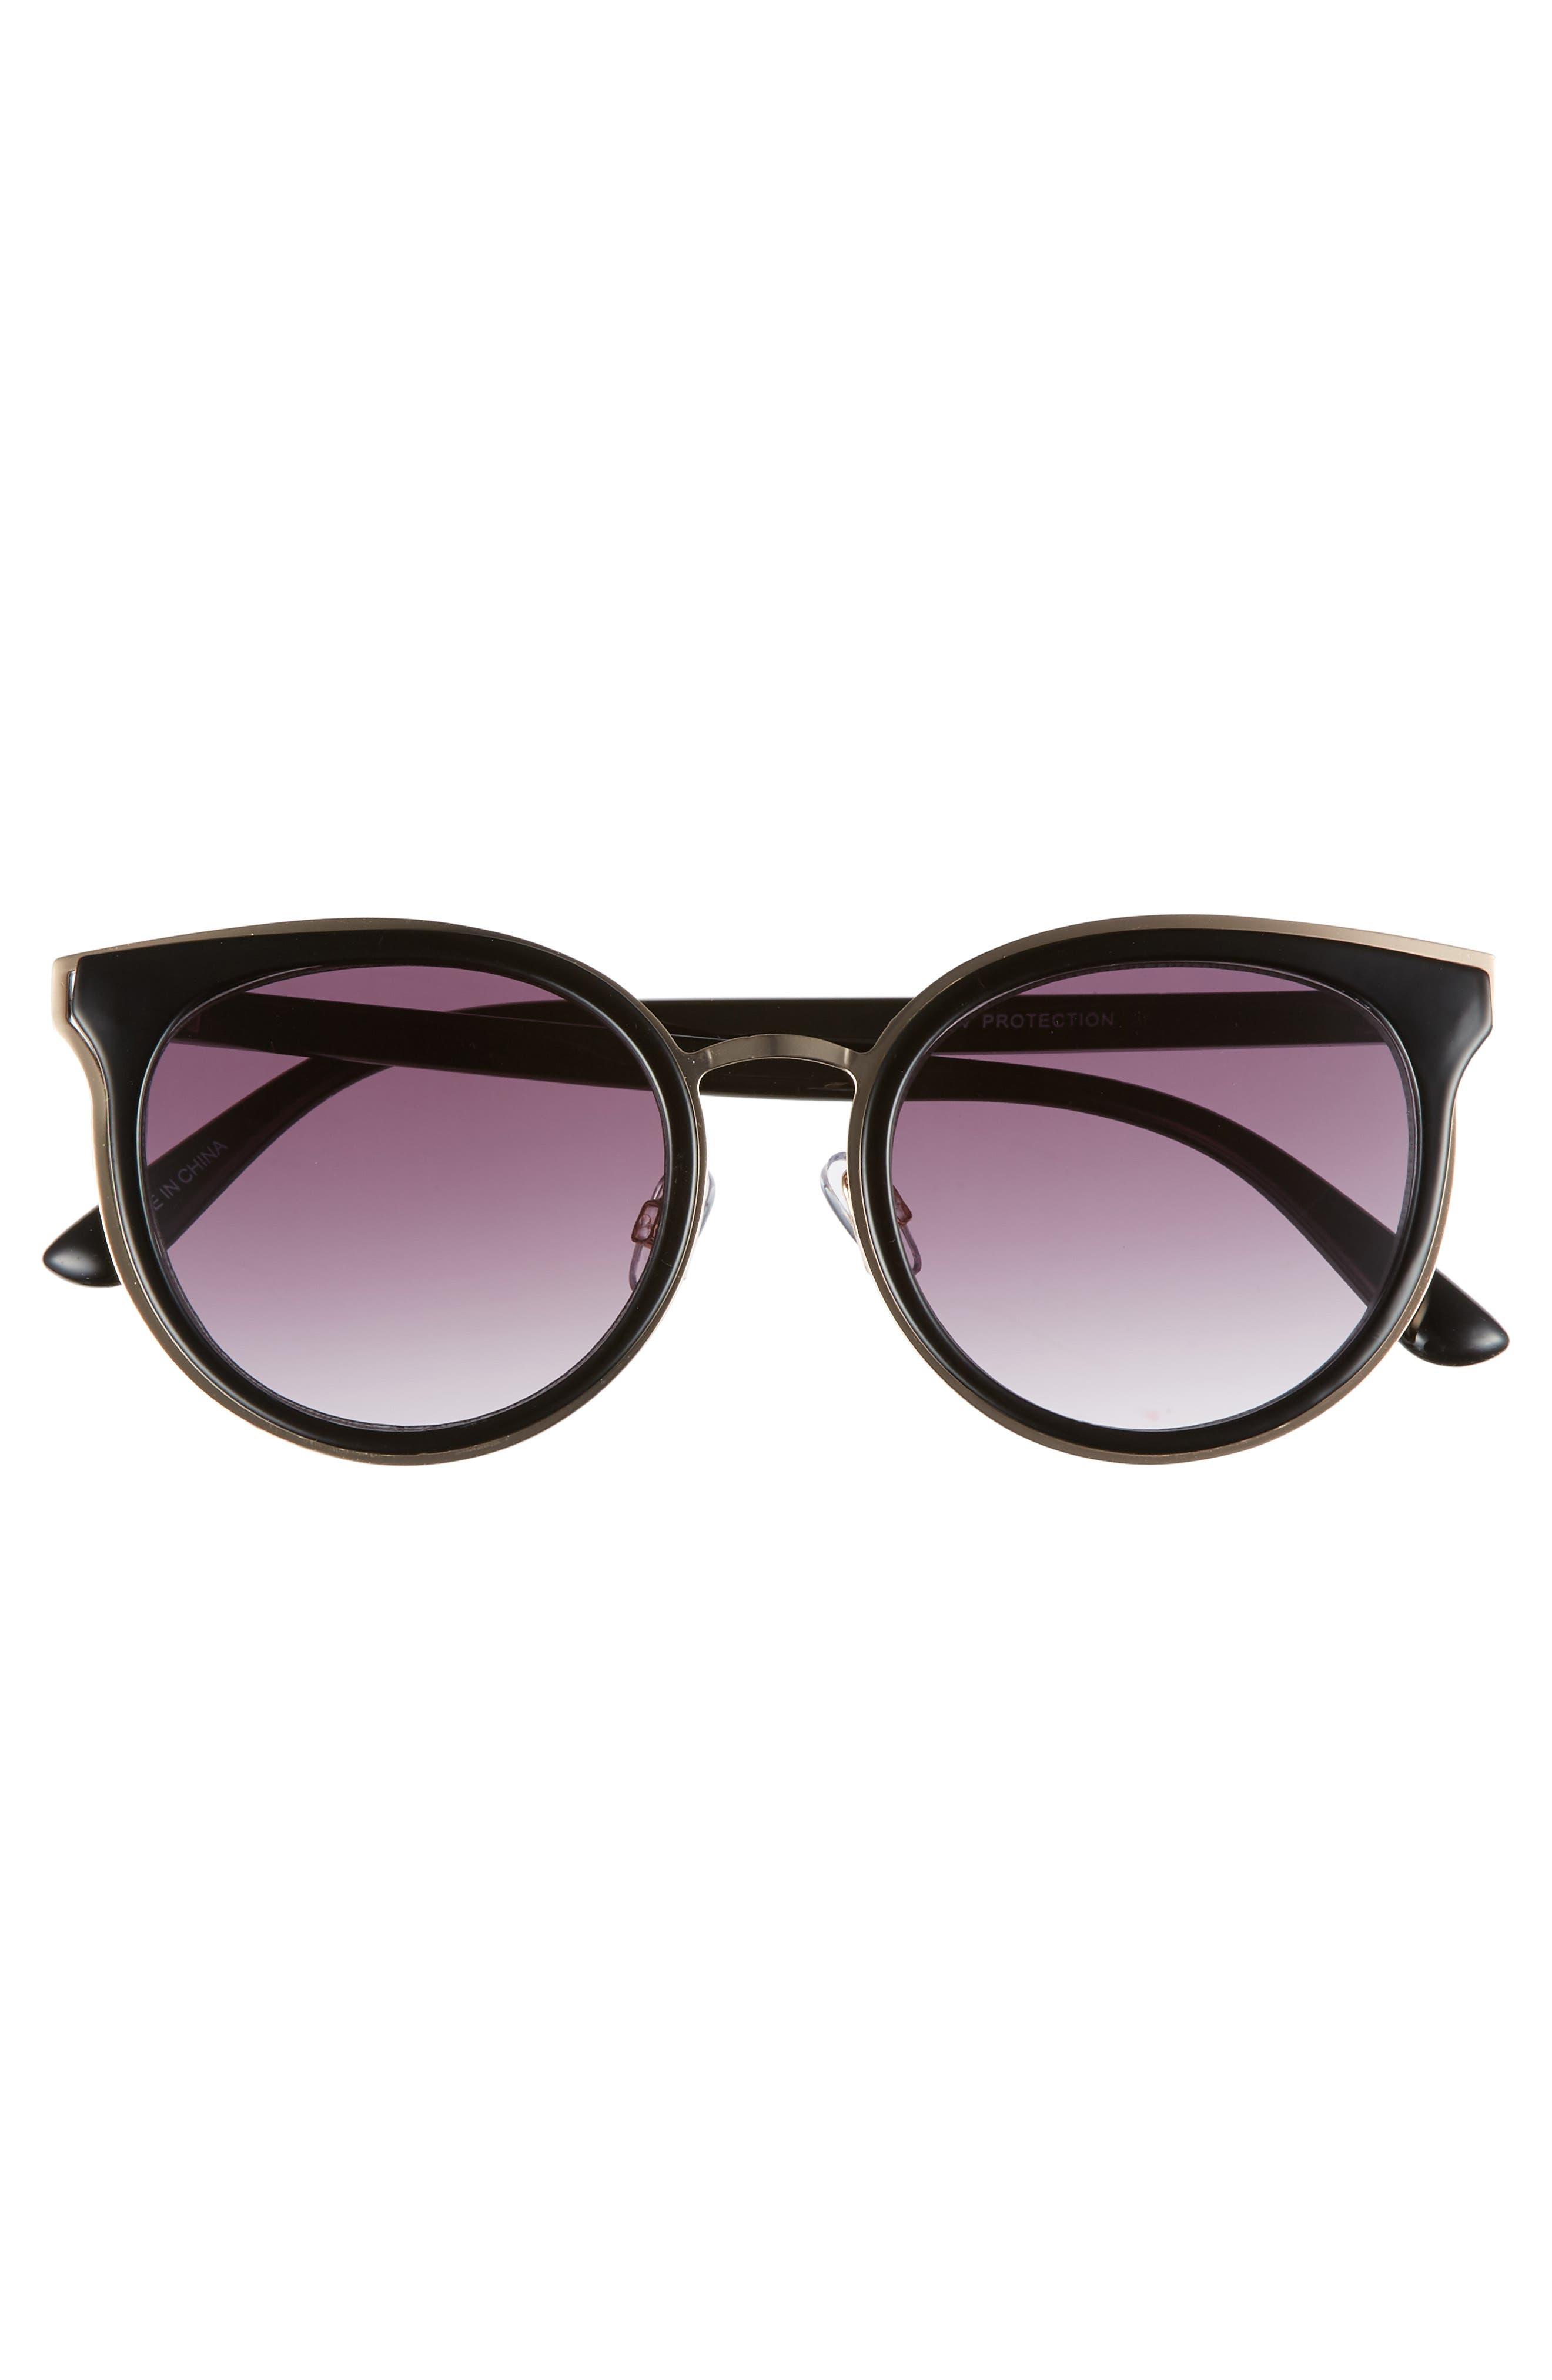 59mm Round Sunglasses,                             Alternate thumbnail 3, color,                             Gold/ Black